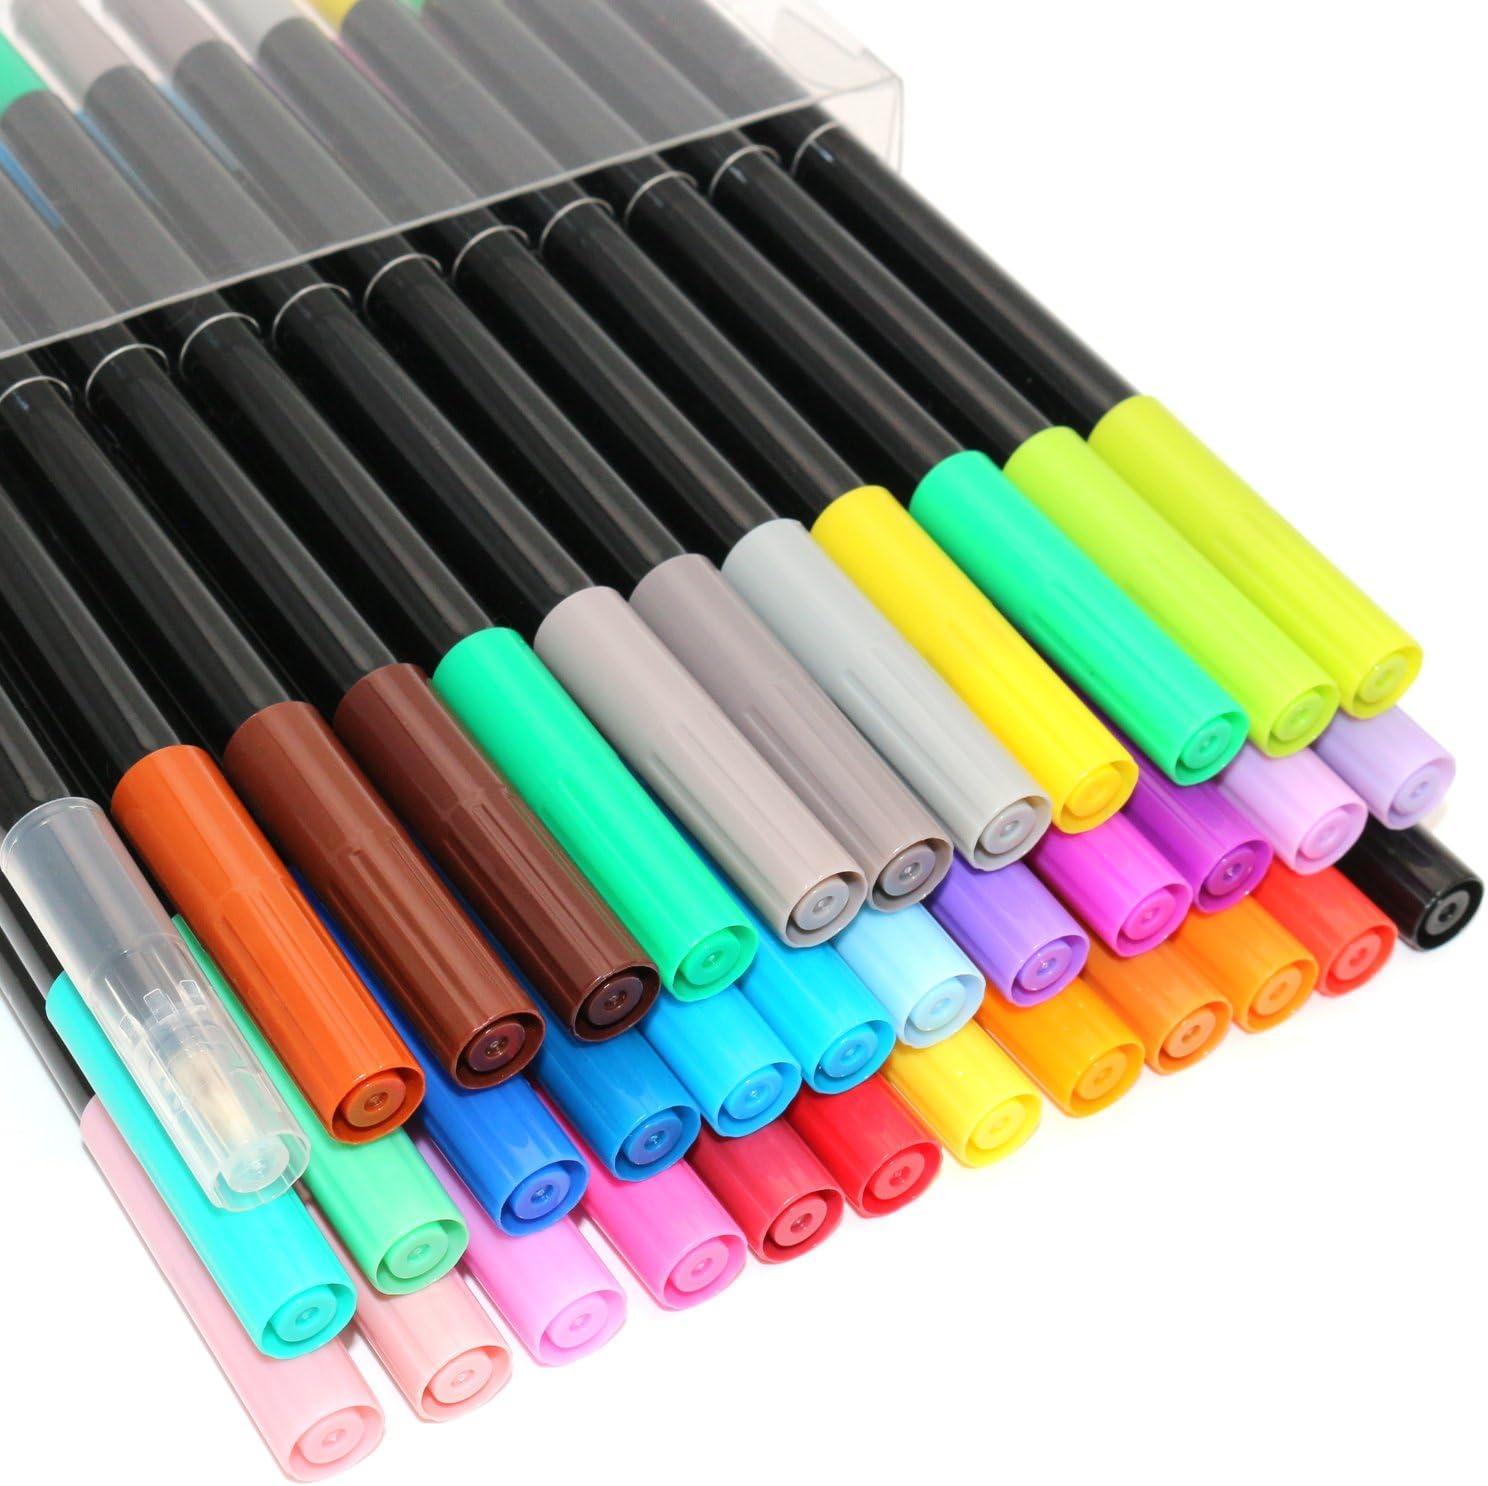 - Amazon.com : Dual Tip Watercolor Art Markers Brush Pen - 100% Acid